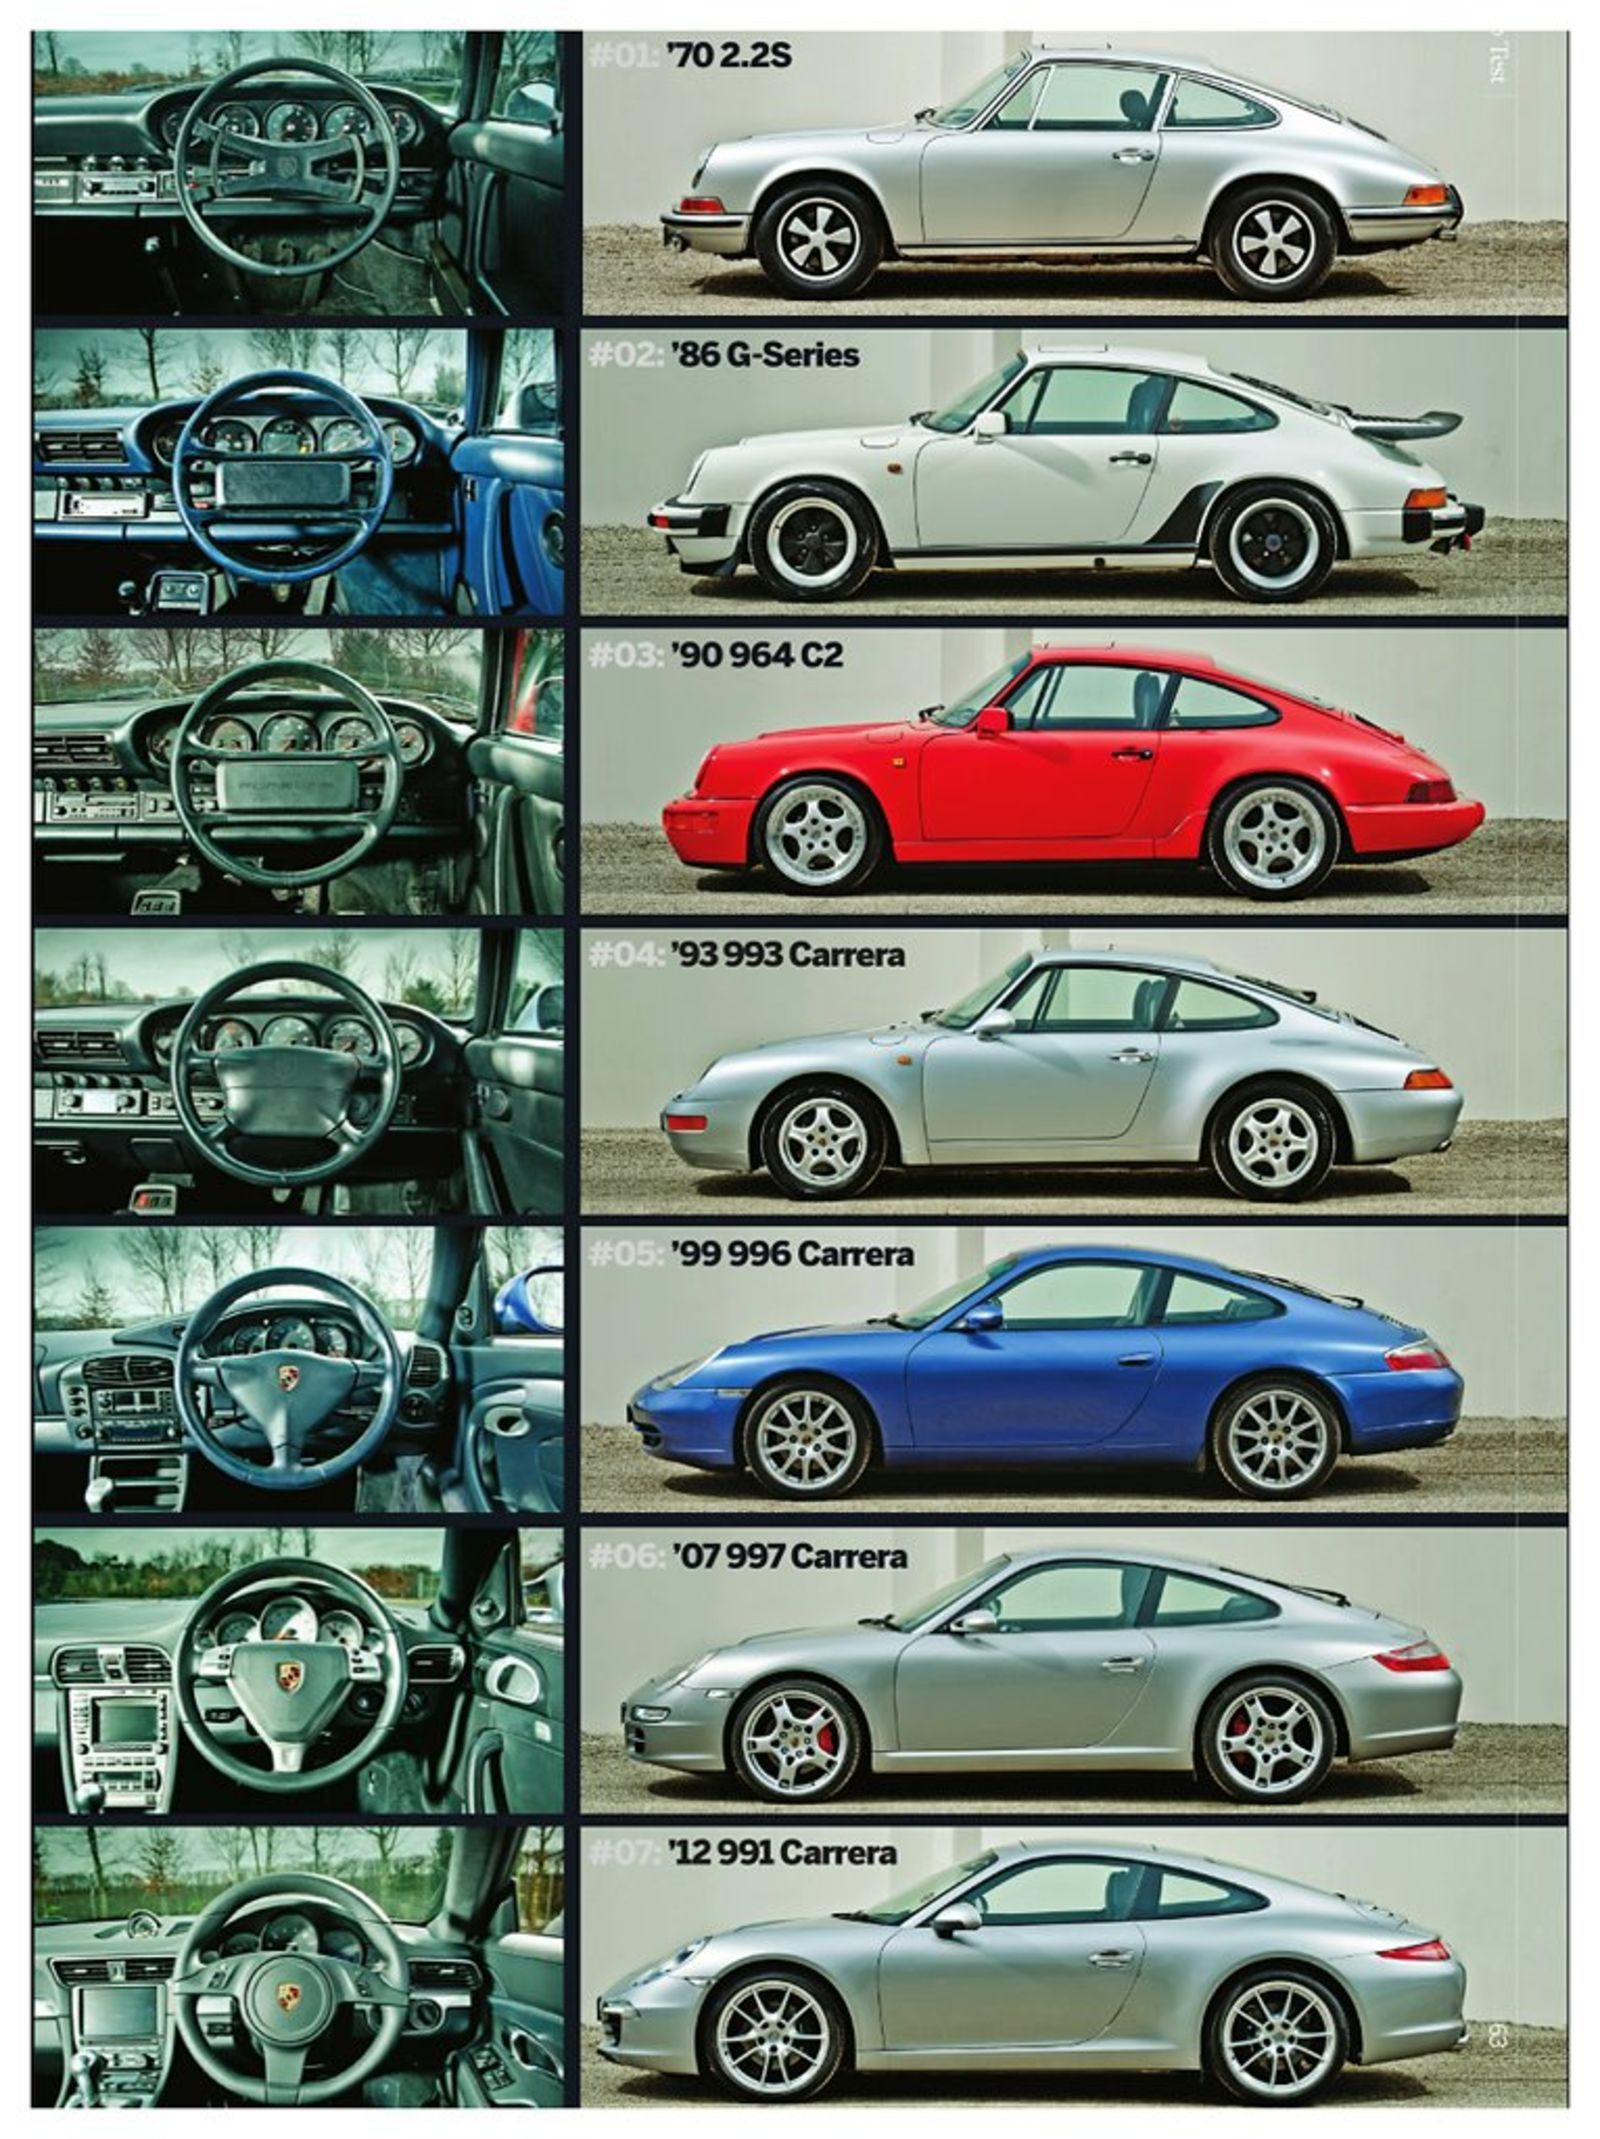 Why No Love For The 993 And Others Porsche 911 Classic Porsche Porsche